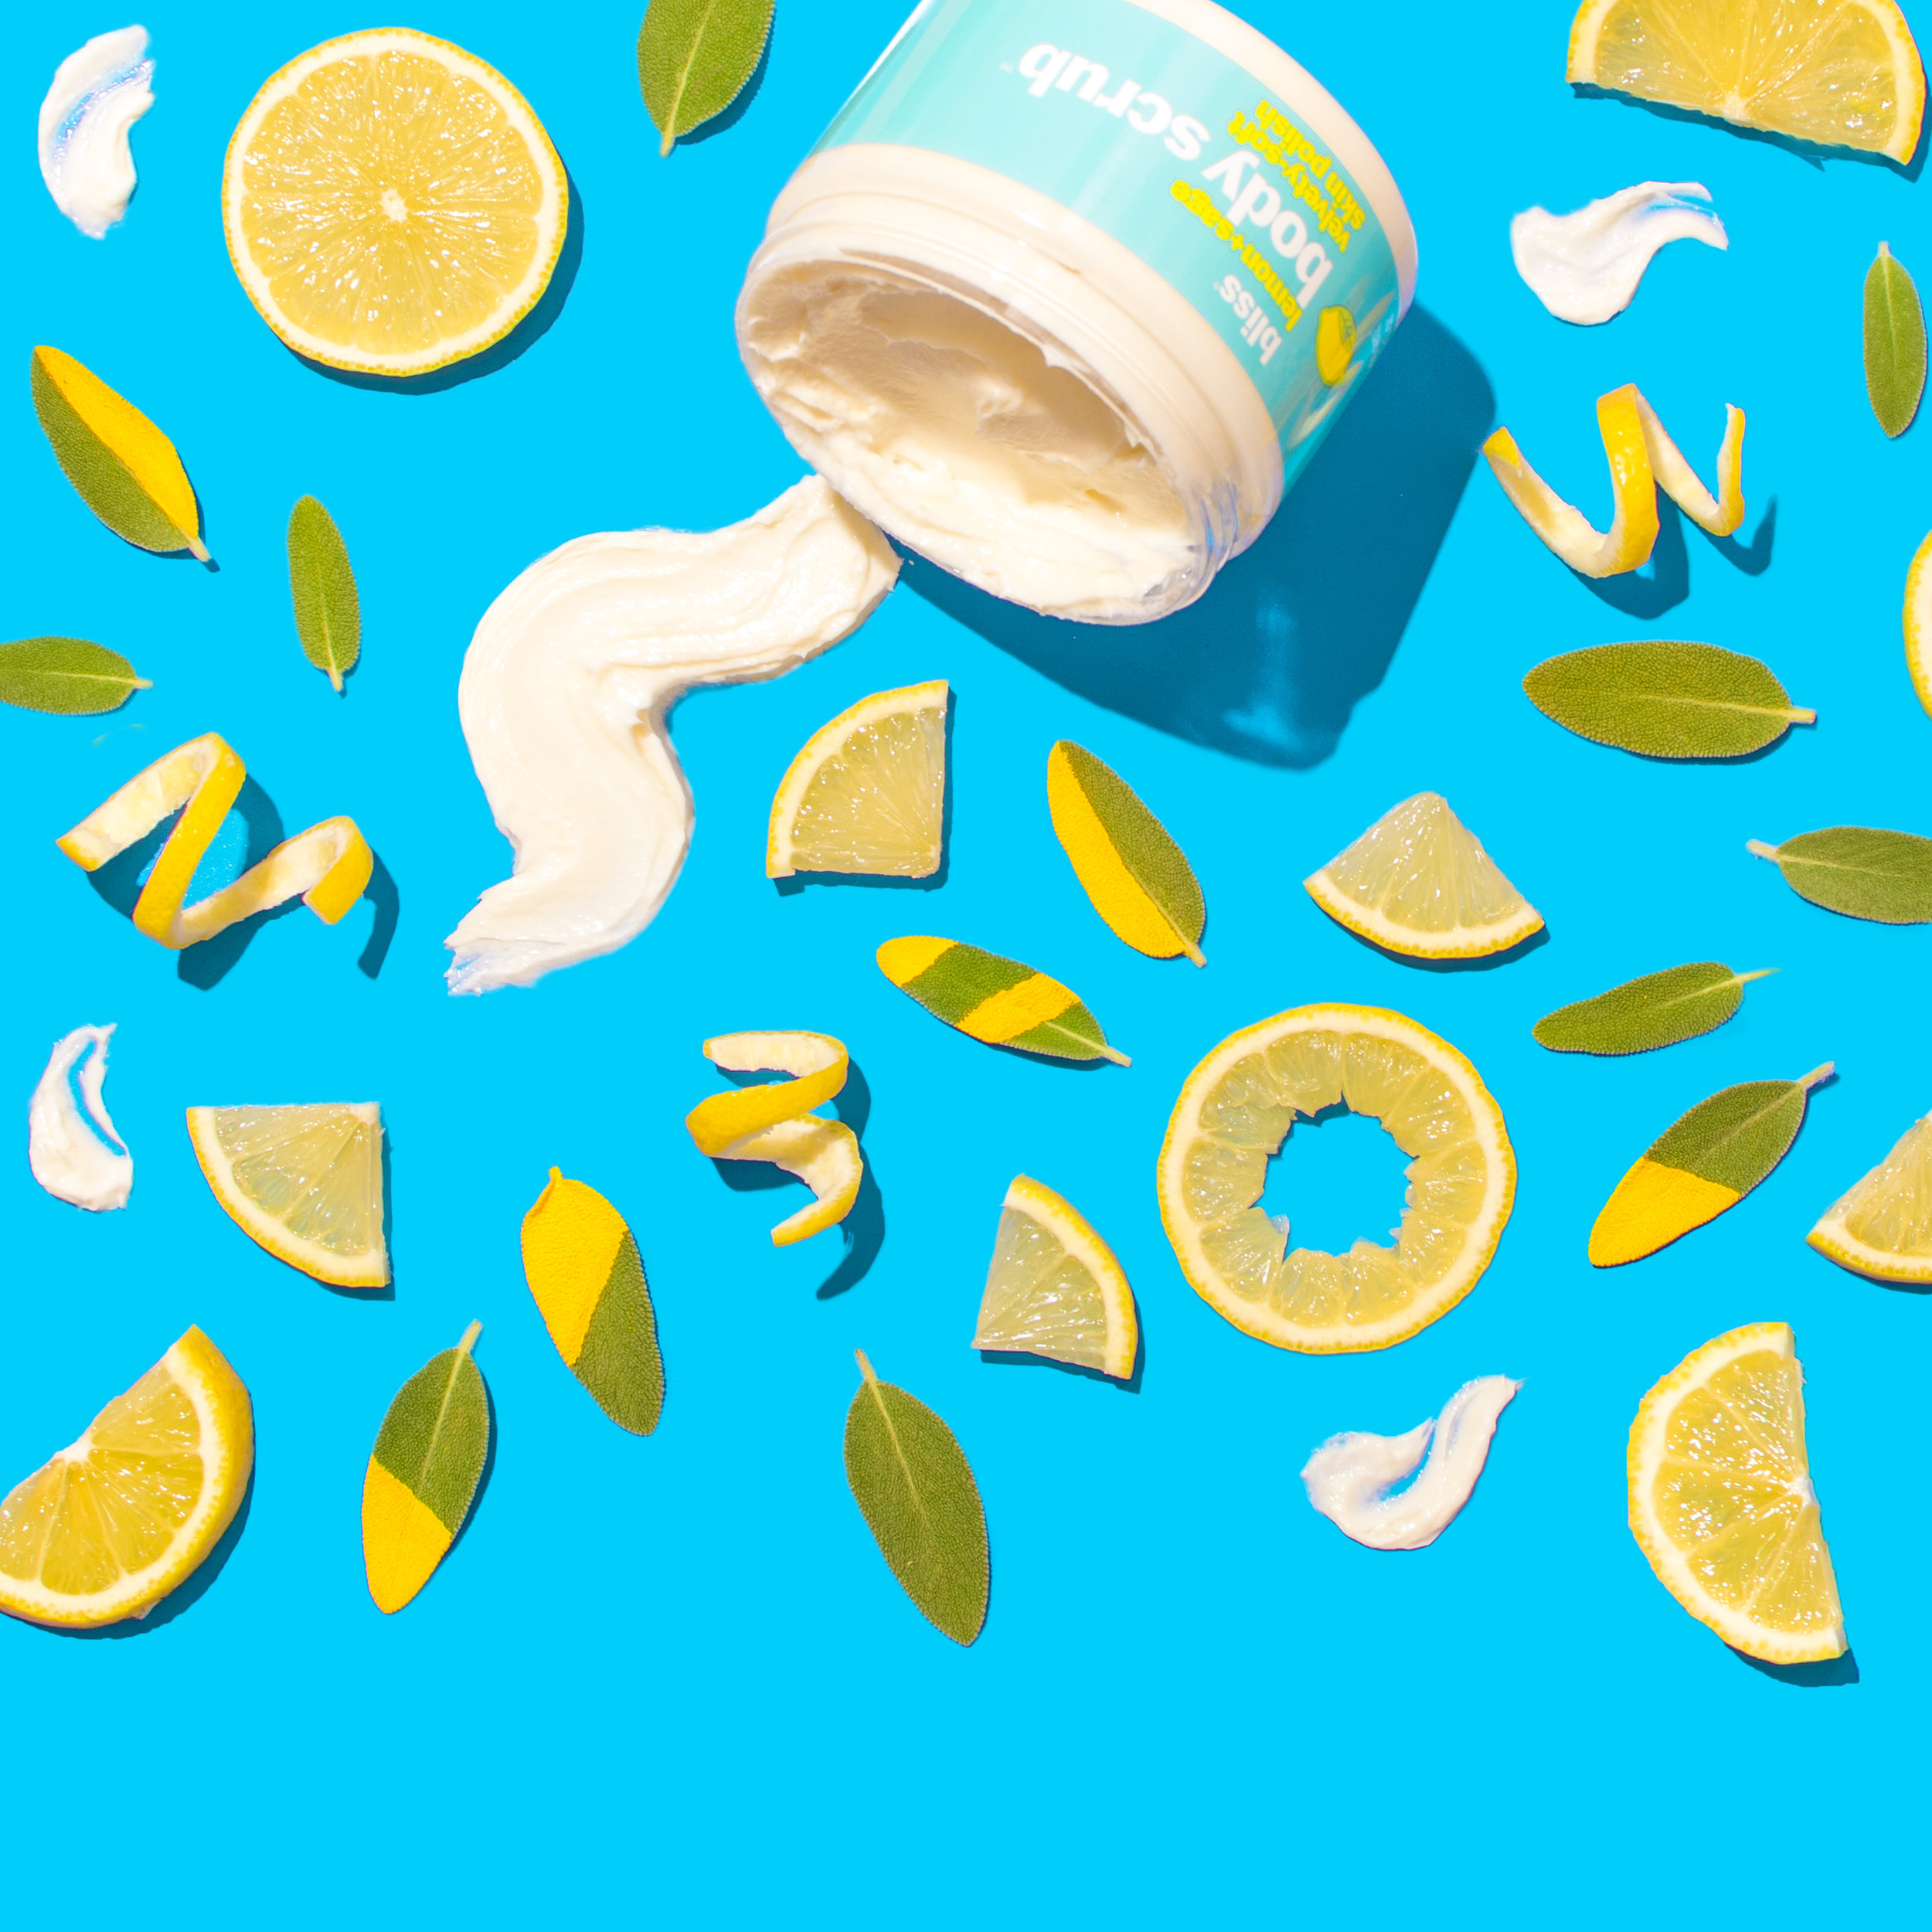 bliss-lemon-sage-02.jpg